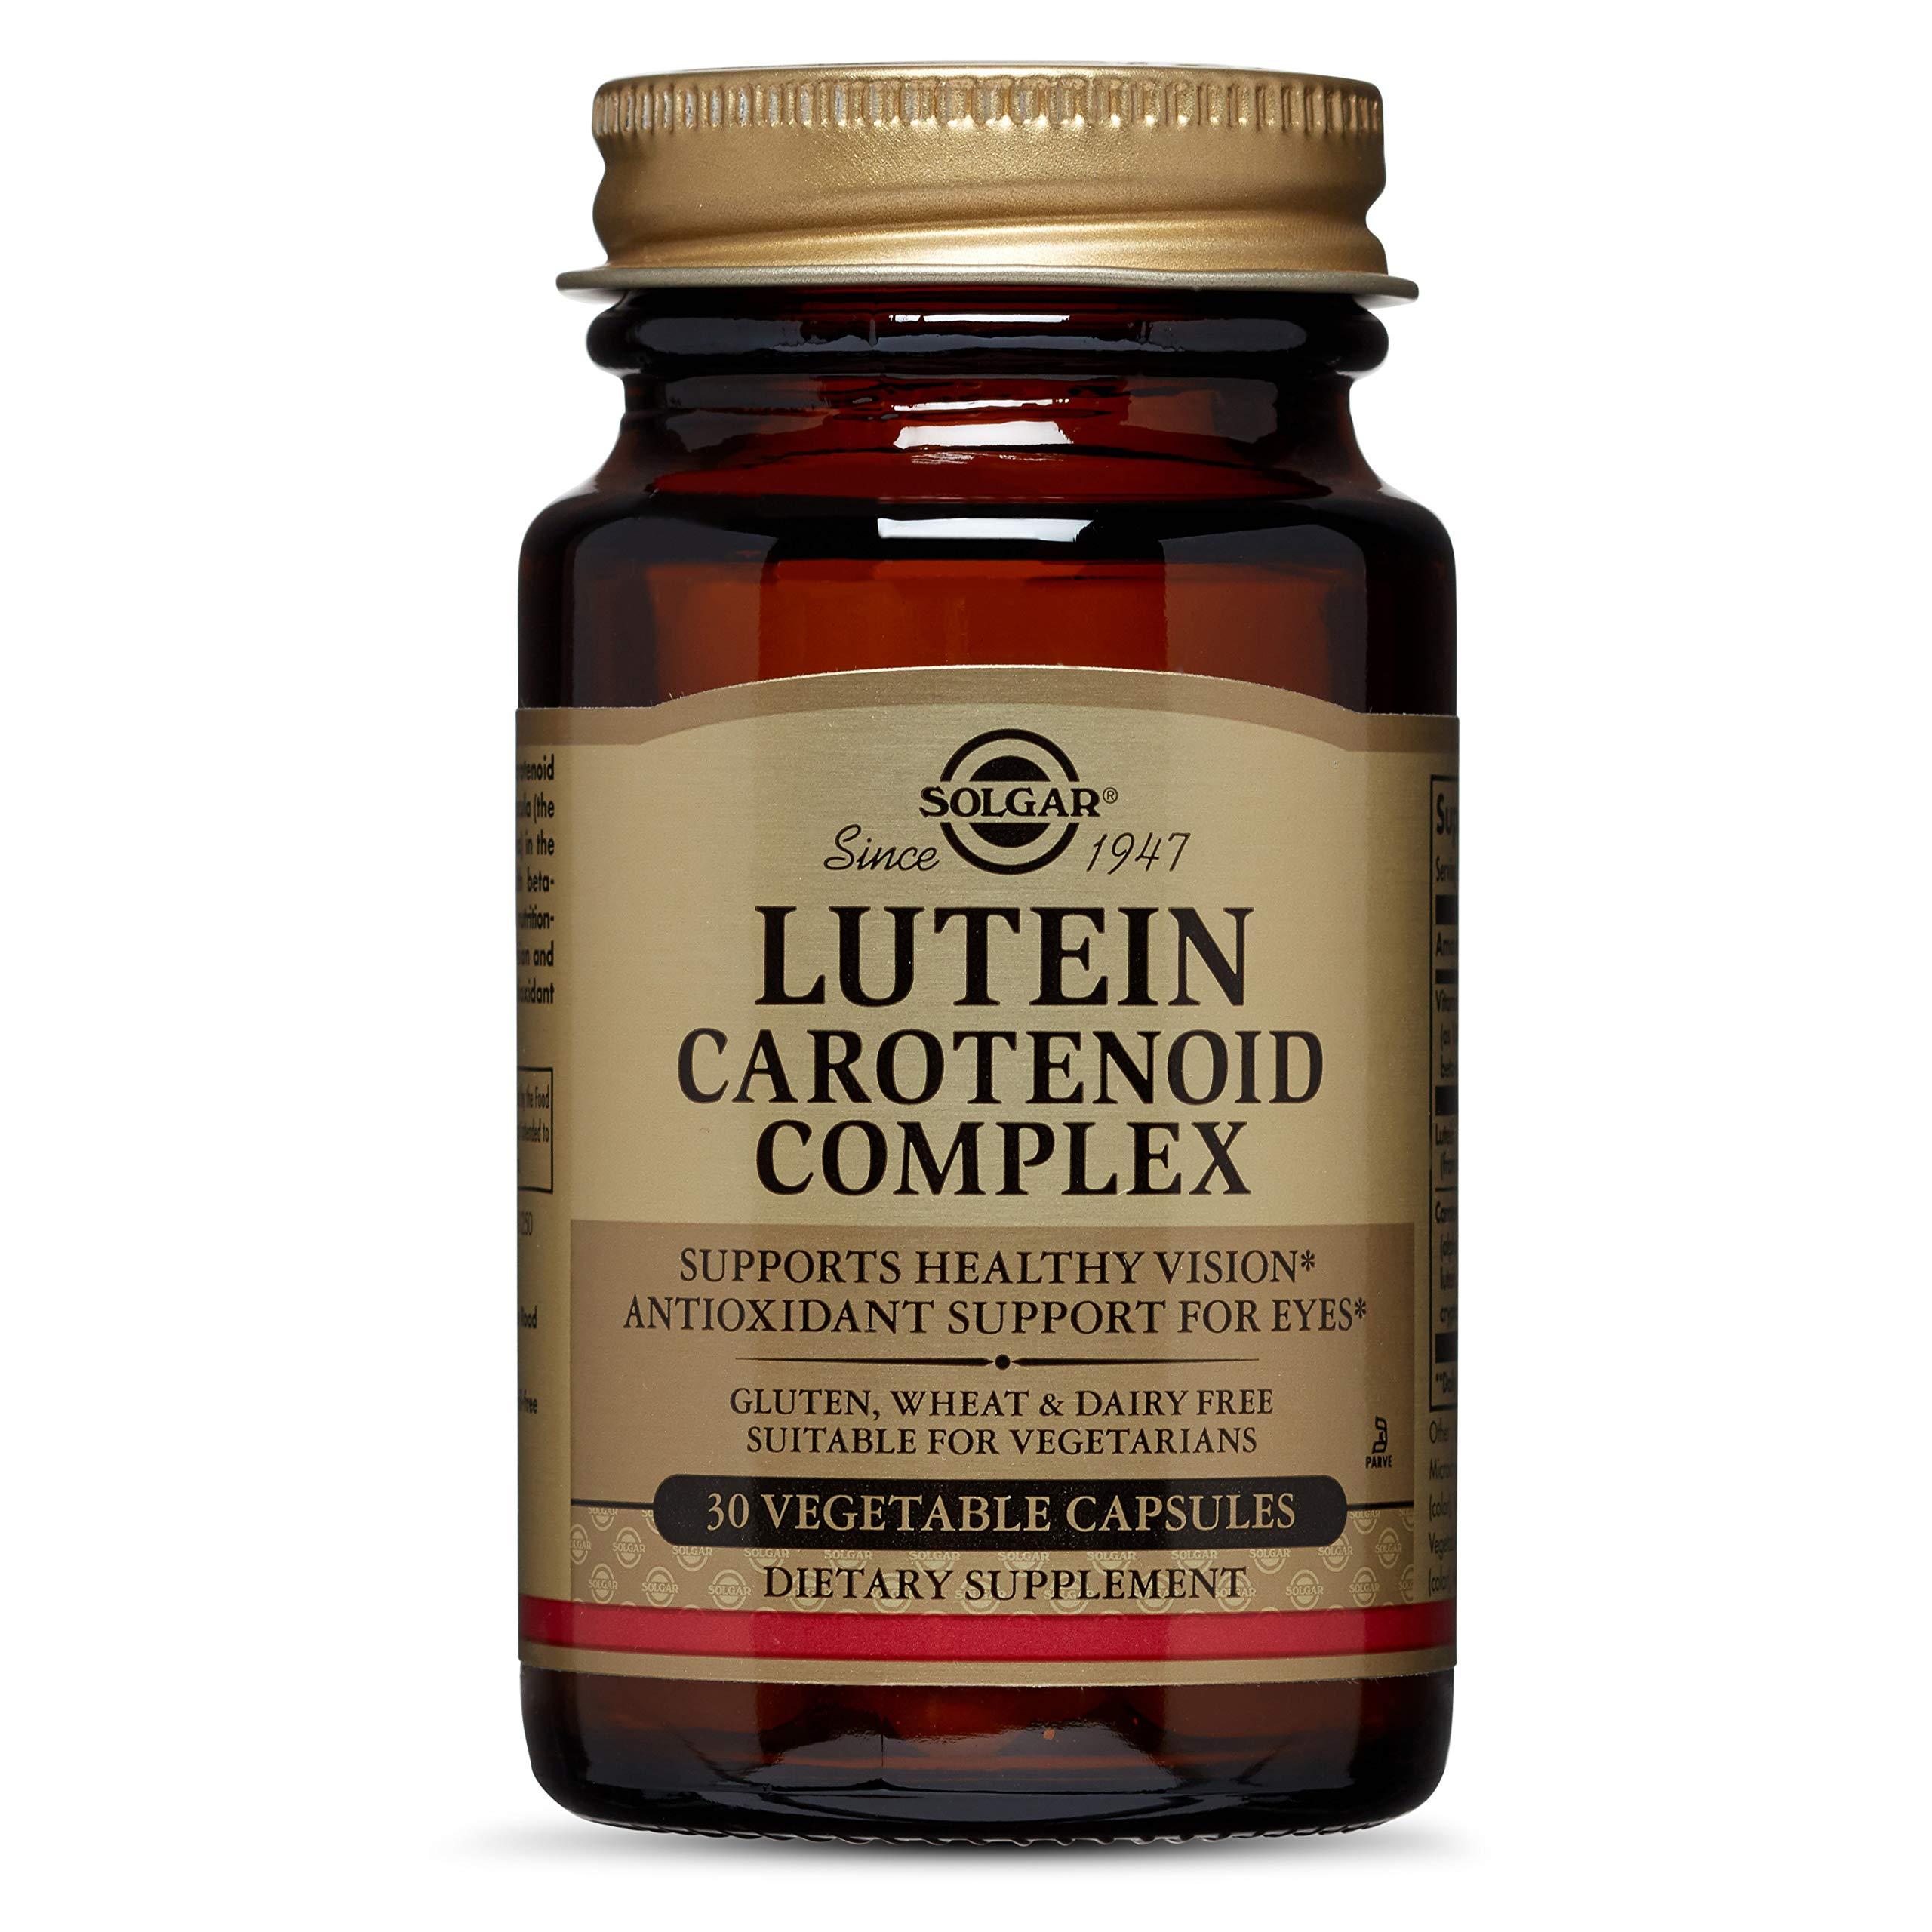 Solgar Lutein Carotenoid Complex Vegetable Capsules, 30 Count by Solgar